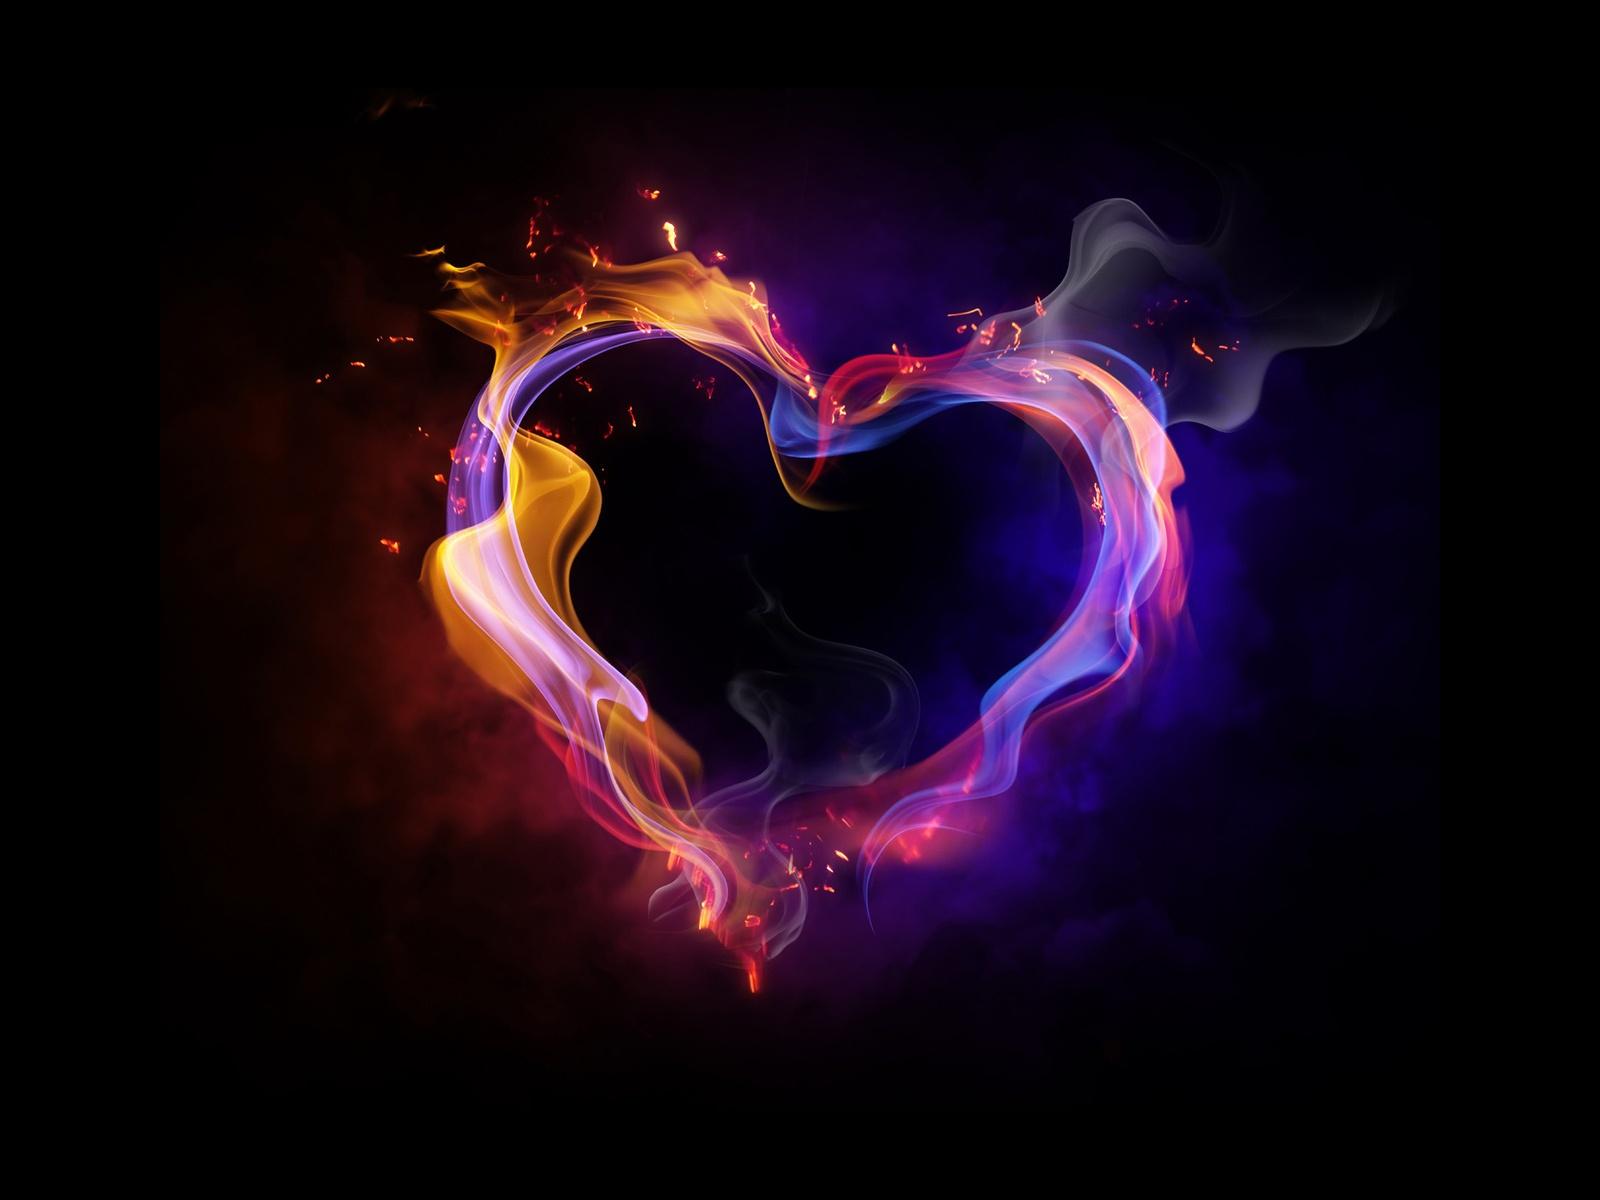 Miracle Love Love Heart Wallpaper